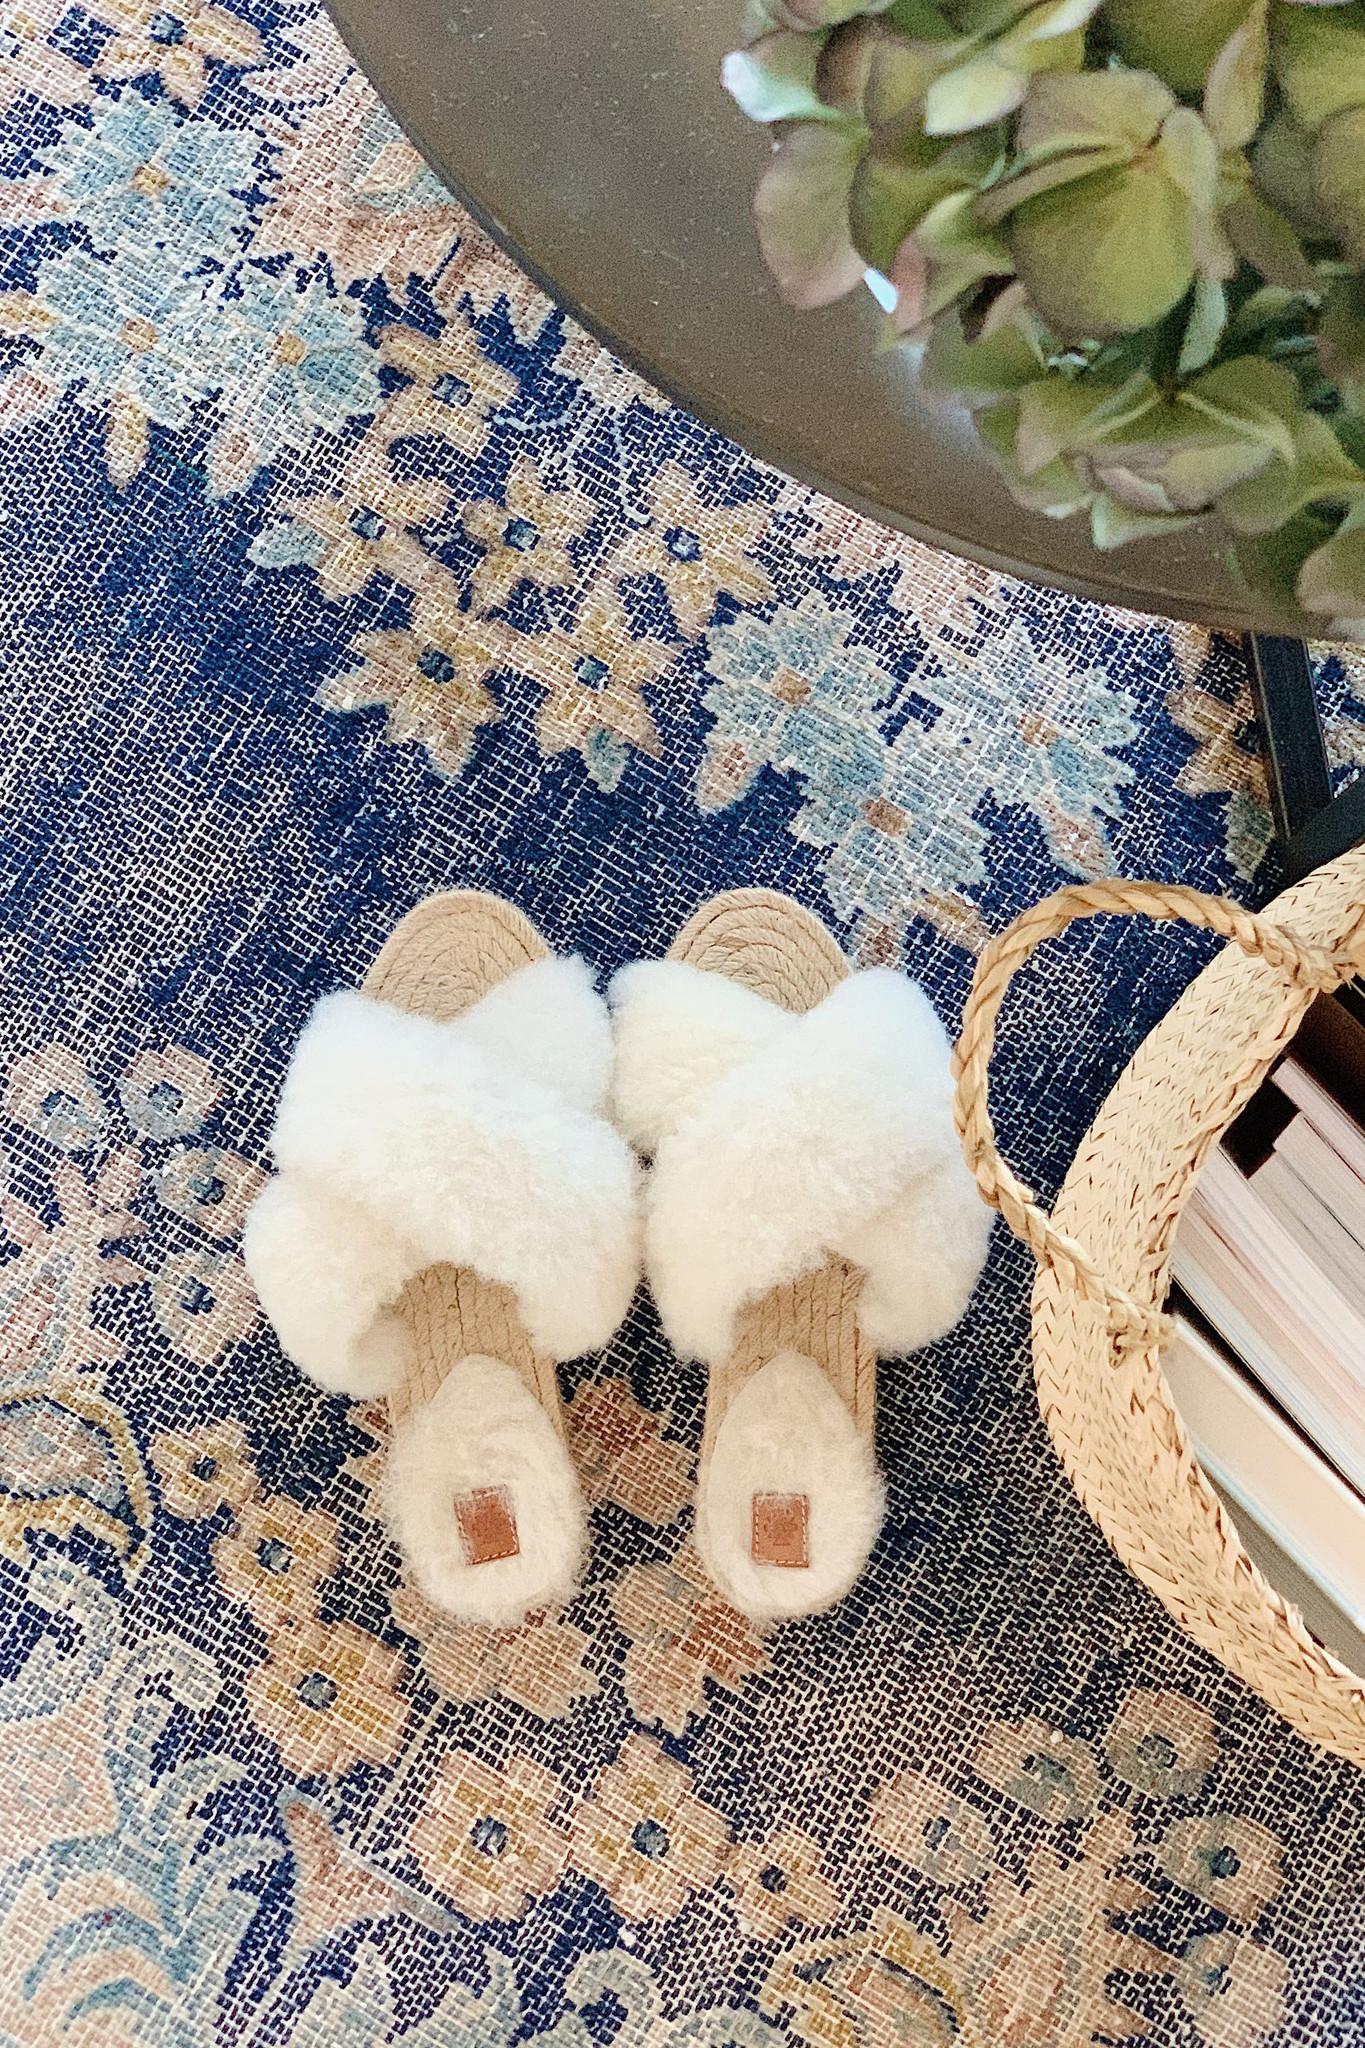 Lori Sheepskin Wool Slippers - Off White-2